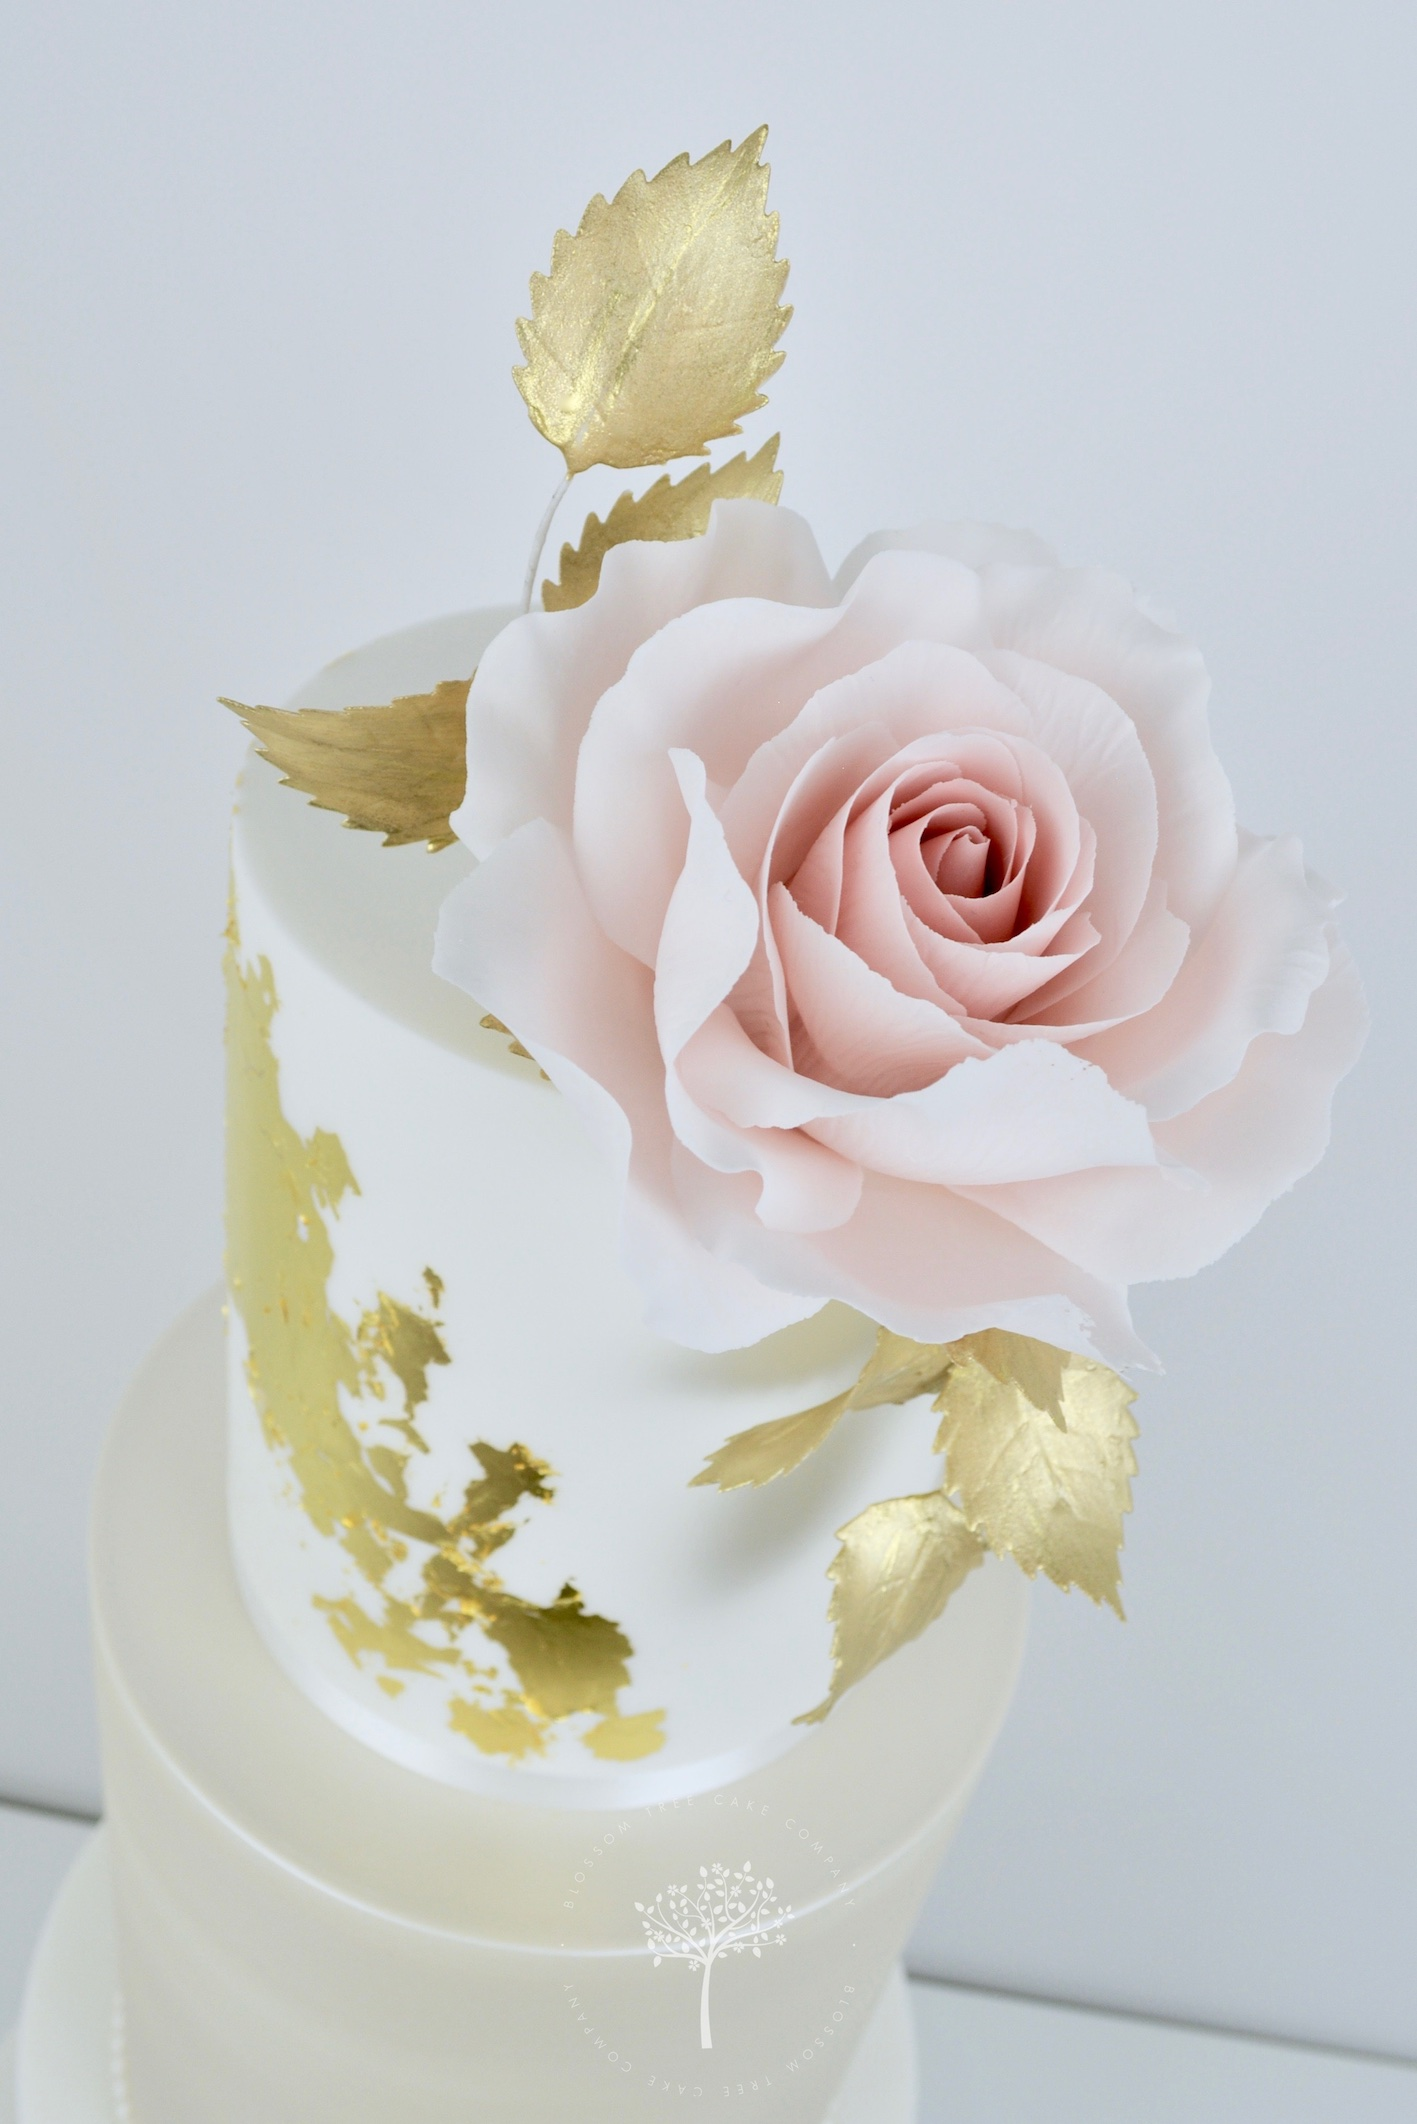 Blush Rose and Champagne wedding cake by Blossom Tree Cake Company Harrogate North Yorkshire - top sugar rose.jpg